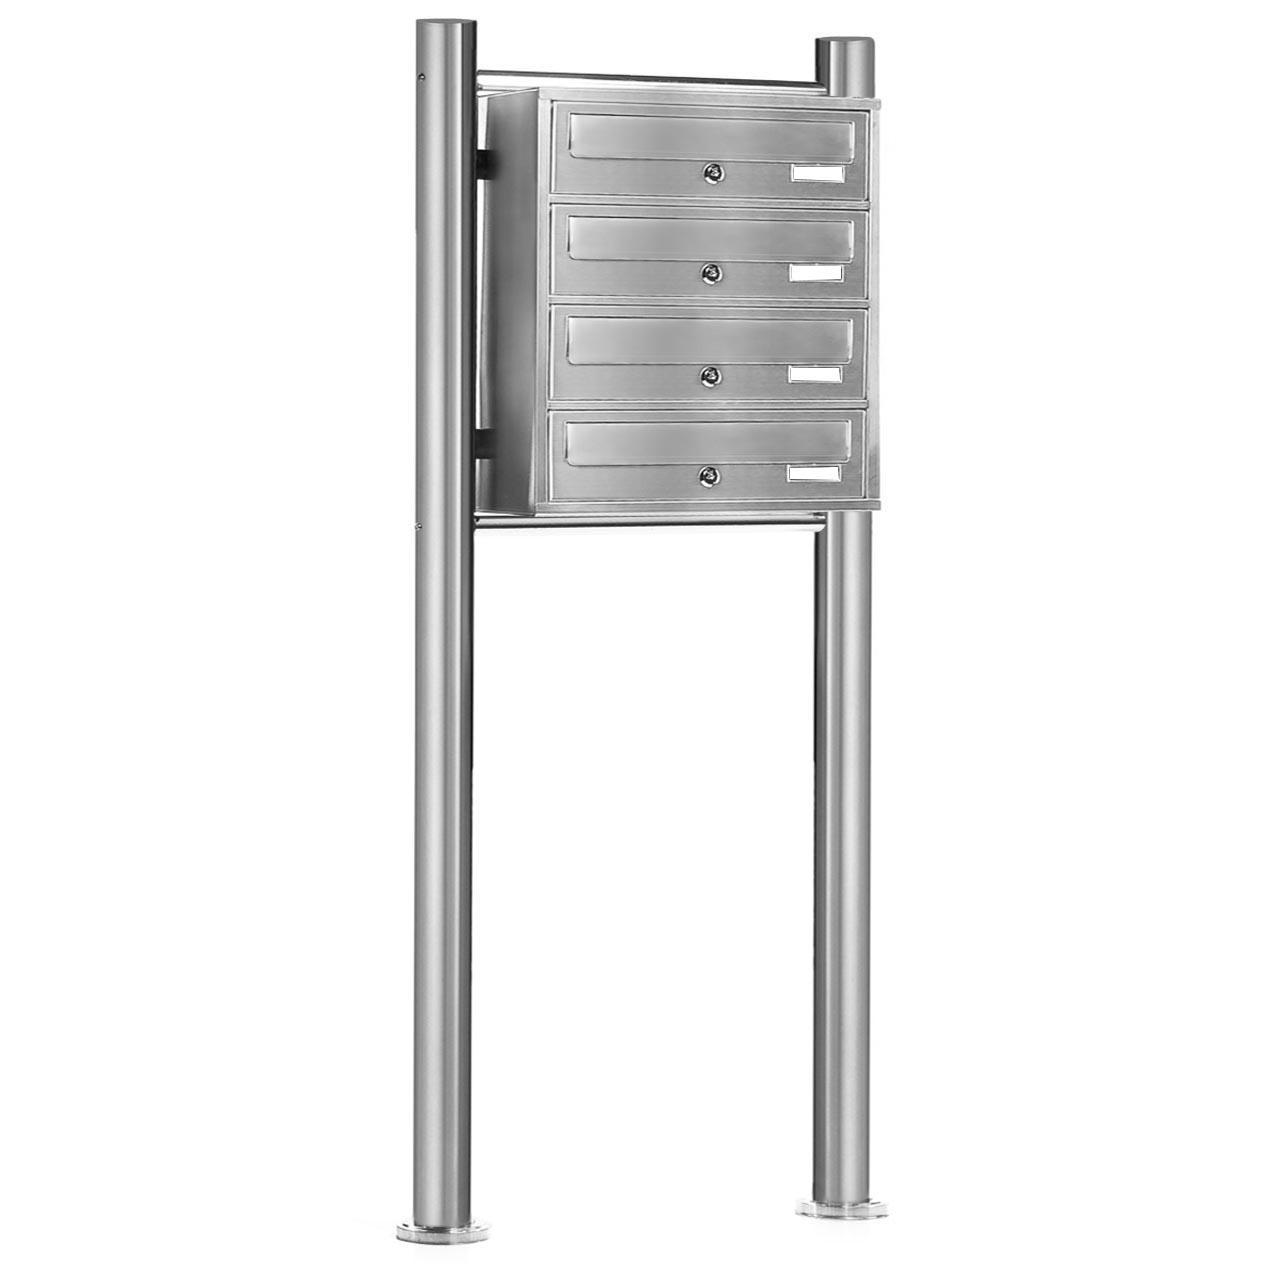 standbriefkasten v2a edelstahl briefkasten anlage system post mailbox postkasten ebay. Black Bedroom Furniture Sets. Home Design Ideas